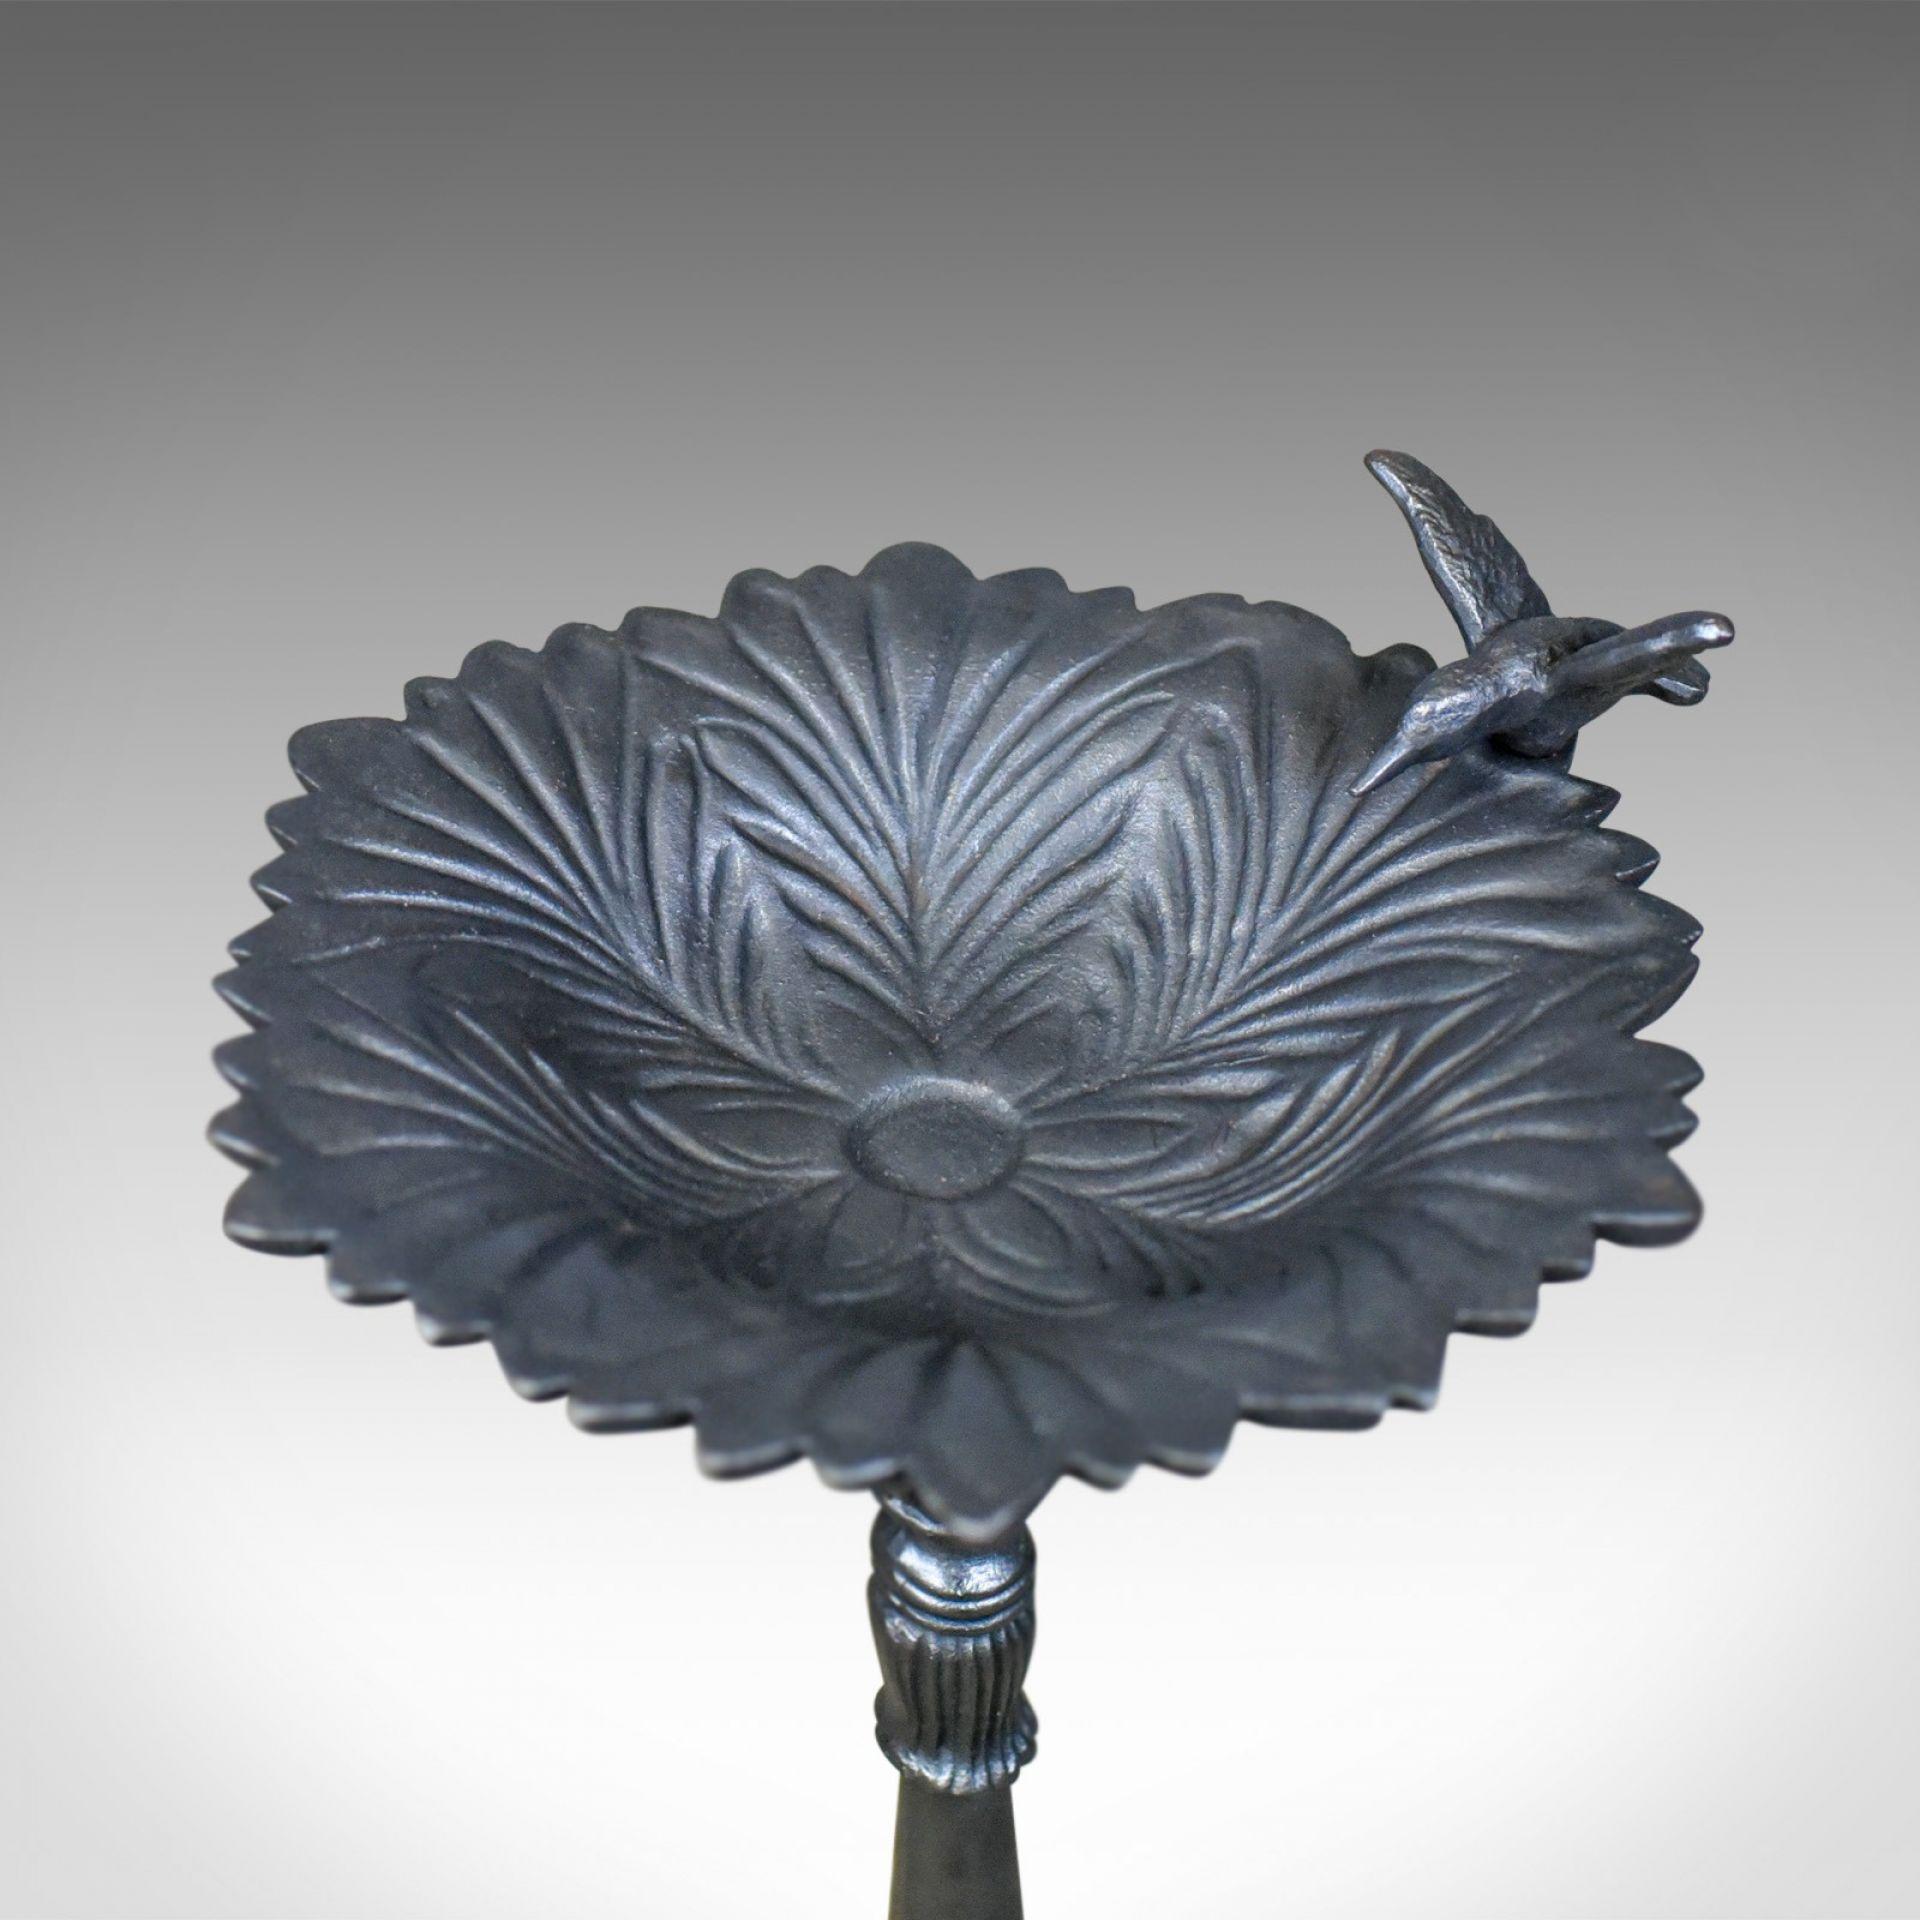 Vintage Birdbath, English, Cast Iron, Feeder, Planter, late 20th Century